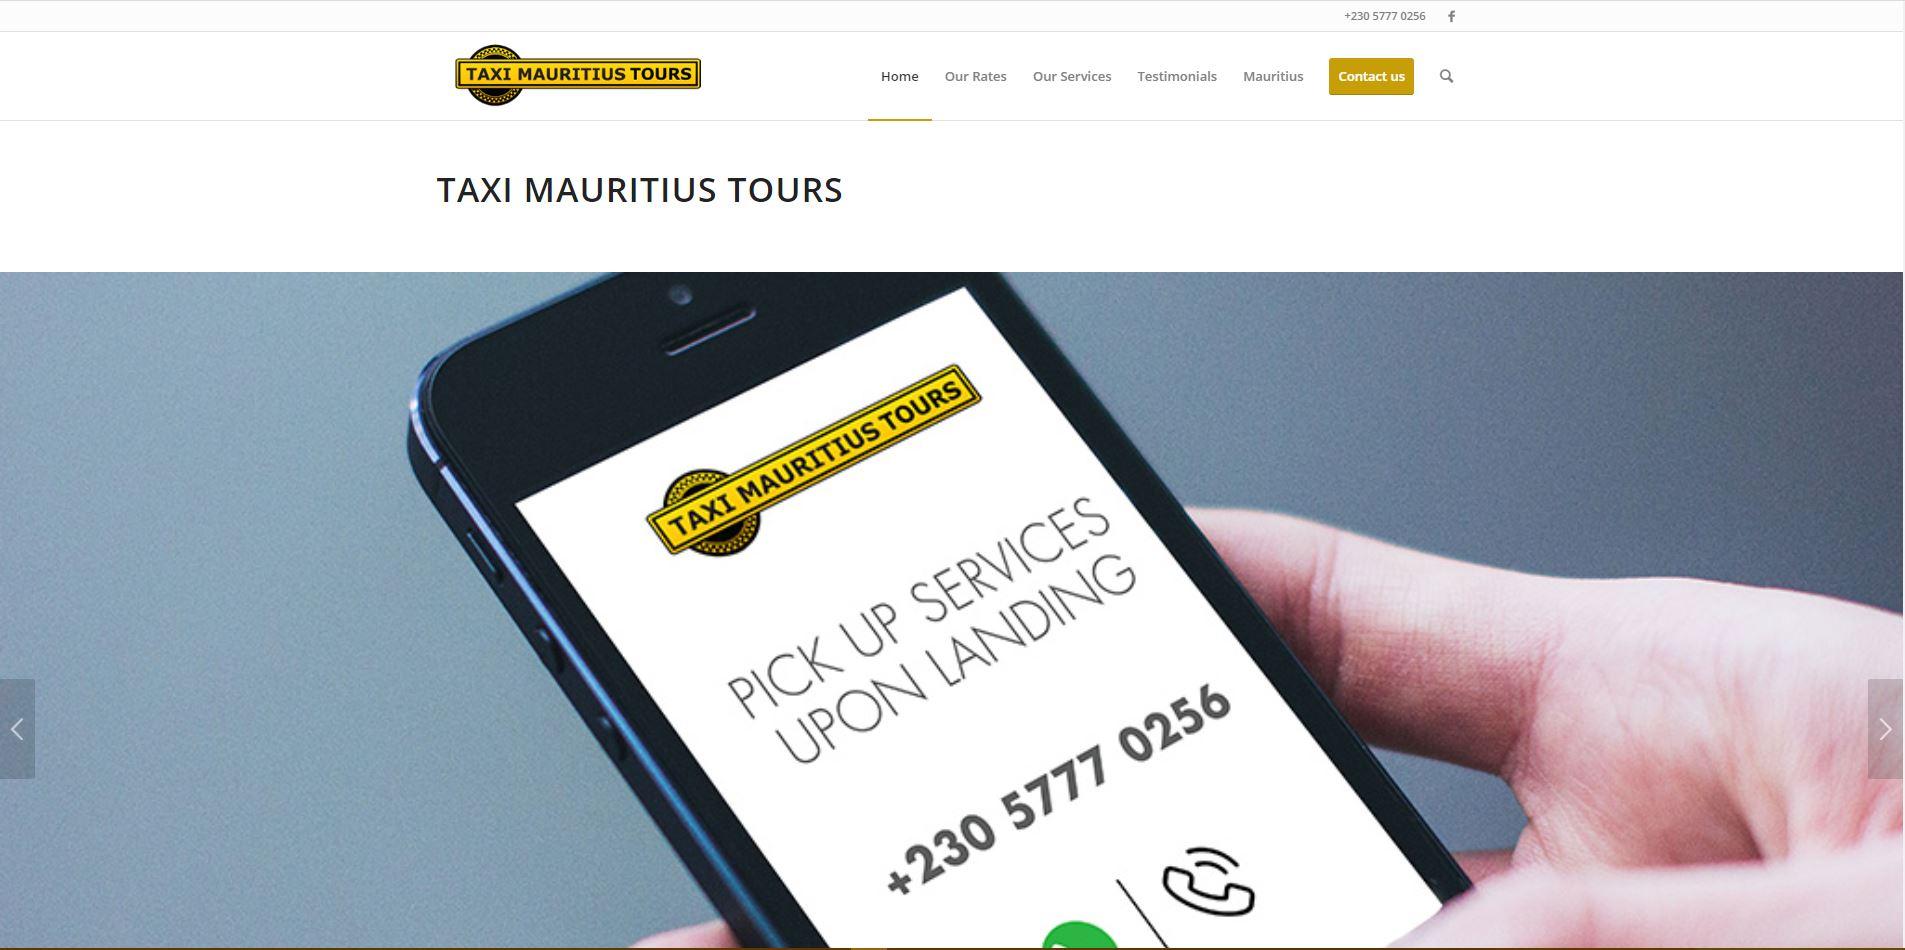 Taxi-Mauritius-Tour-Digital-Marketing-Mauritius-Ecommerce